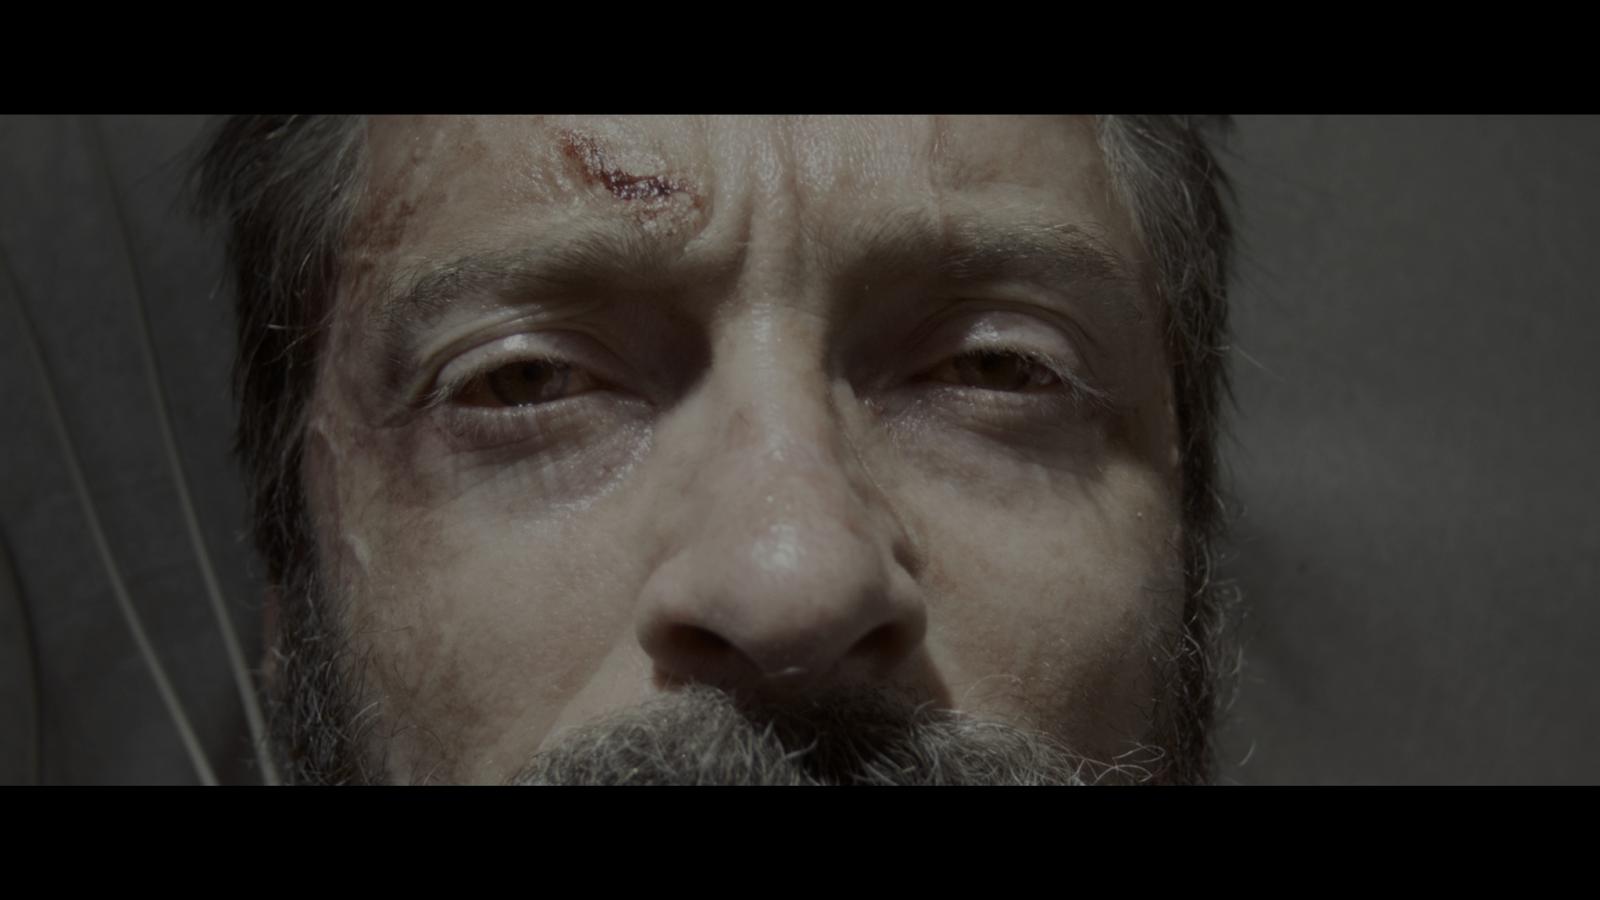 Logan: Wolverine (2017) 4K UHD Blu-Ray Completo captura 4